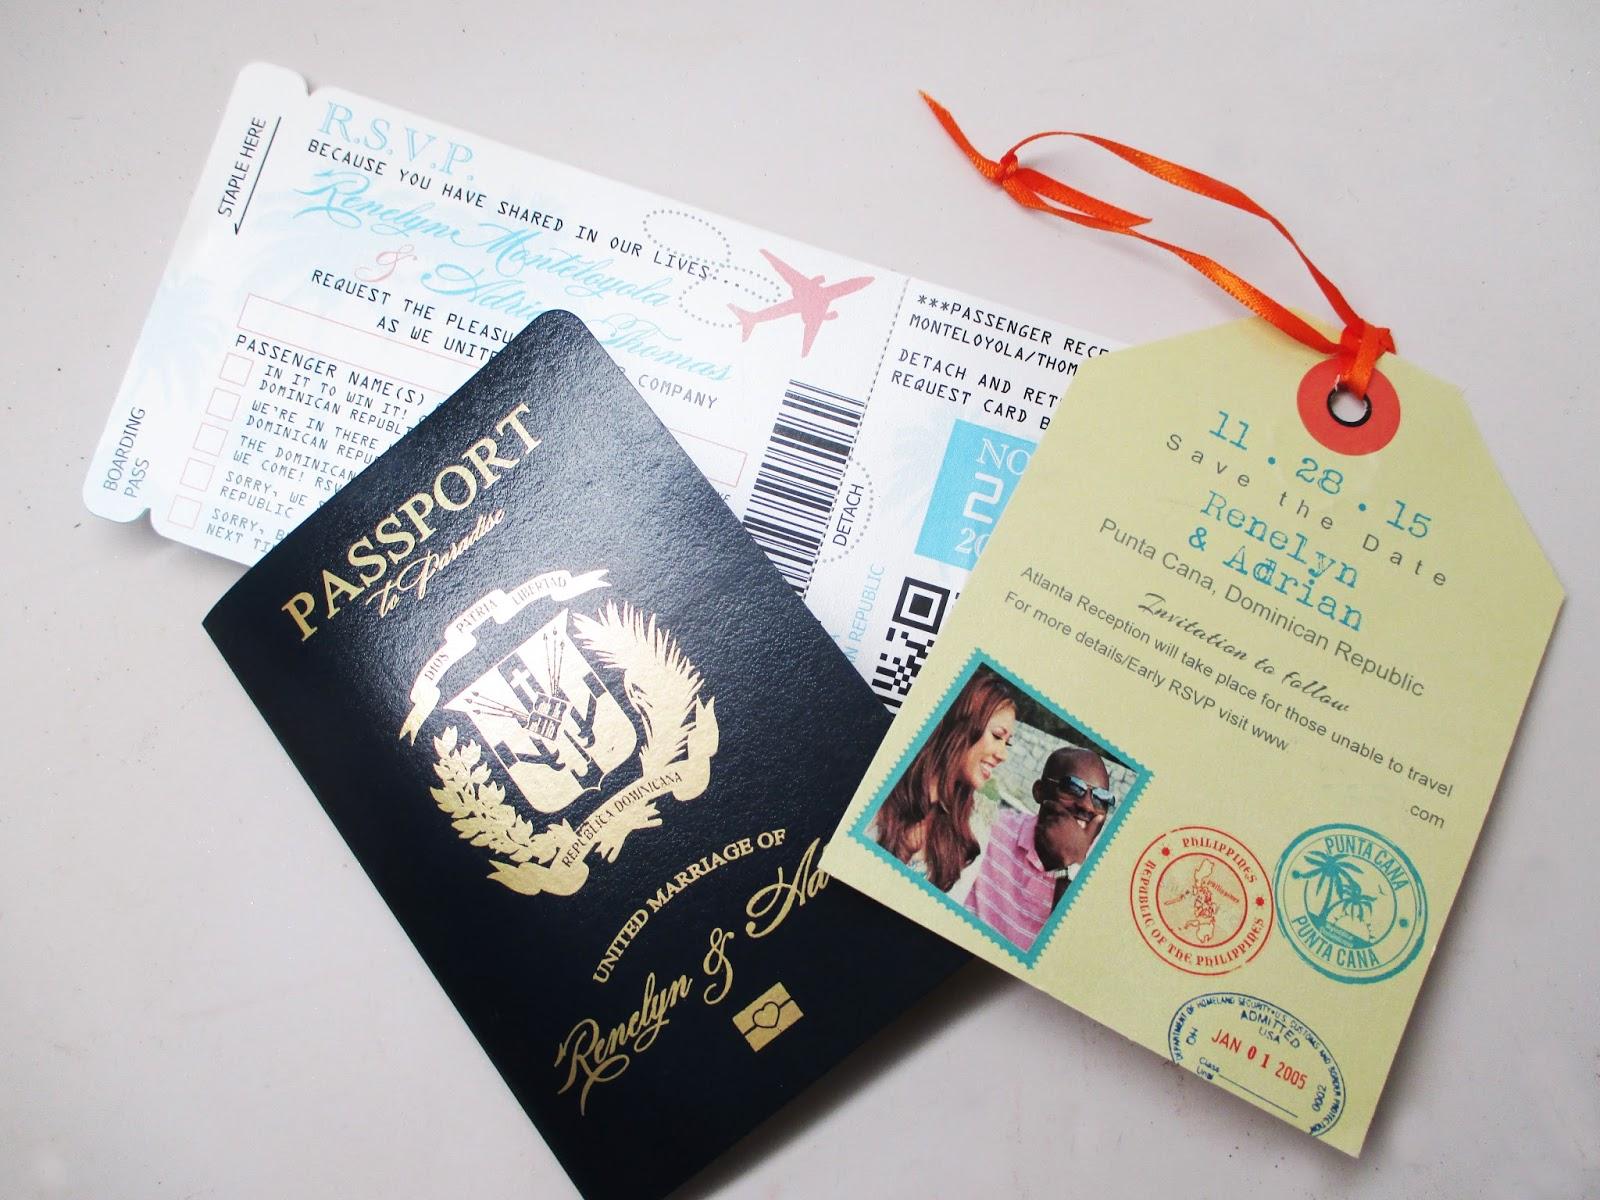 Destination Wedding Invitations When To Send: Wedding Series: Our Destination Wedding Save The Dates And